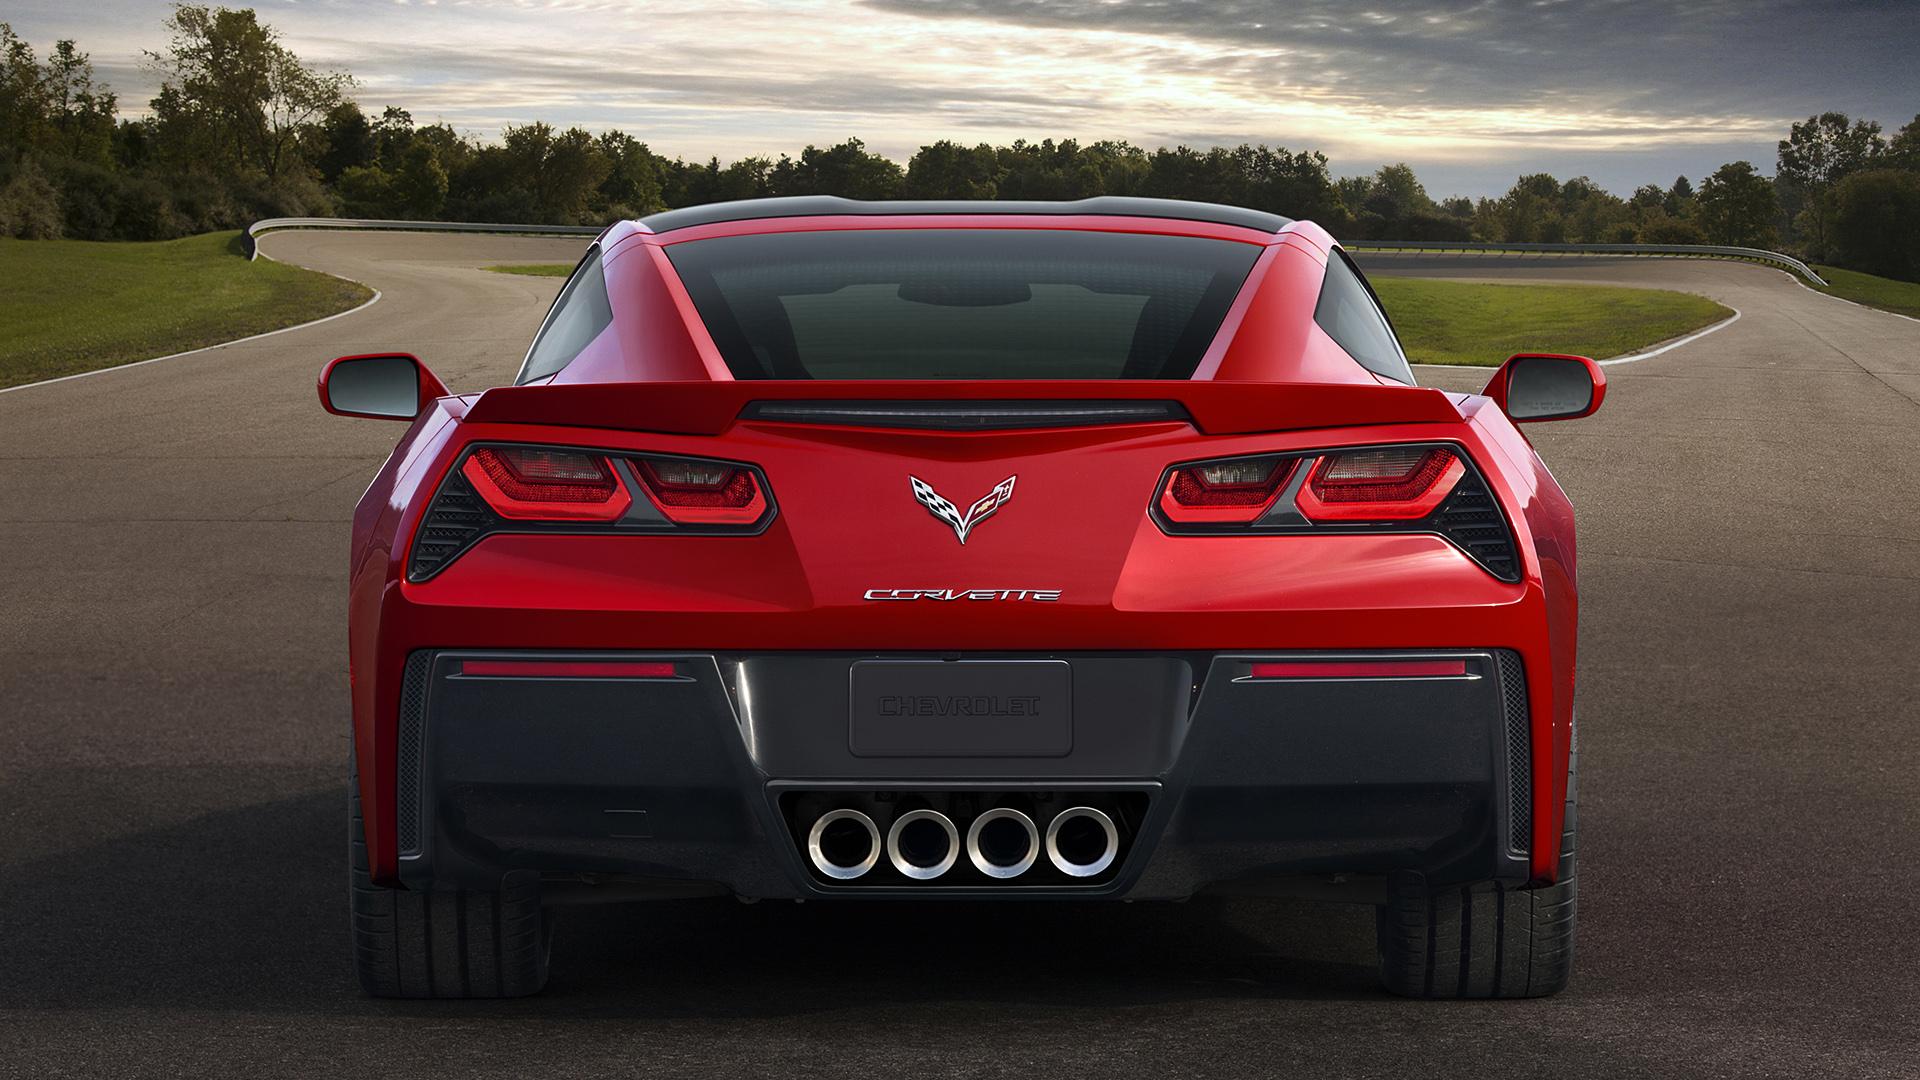 2014 Chevrolet Corvette C7 Stingray Wallpapers 1920x1080